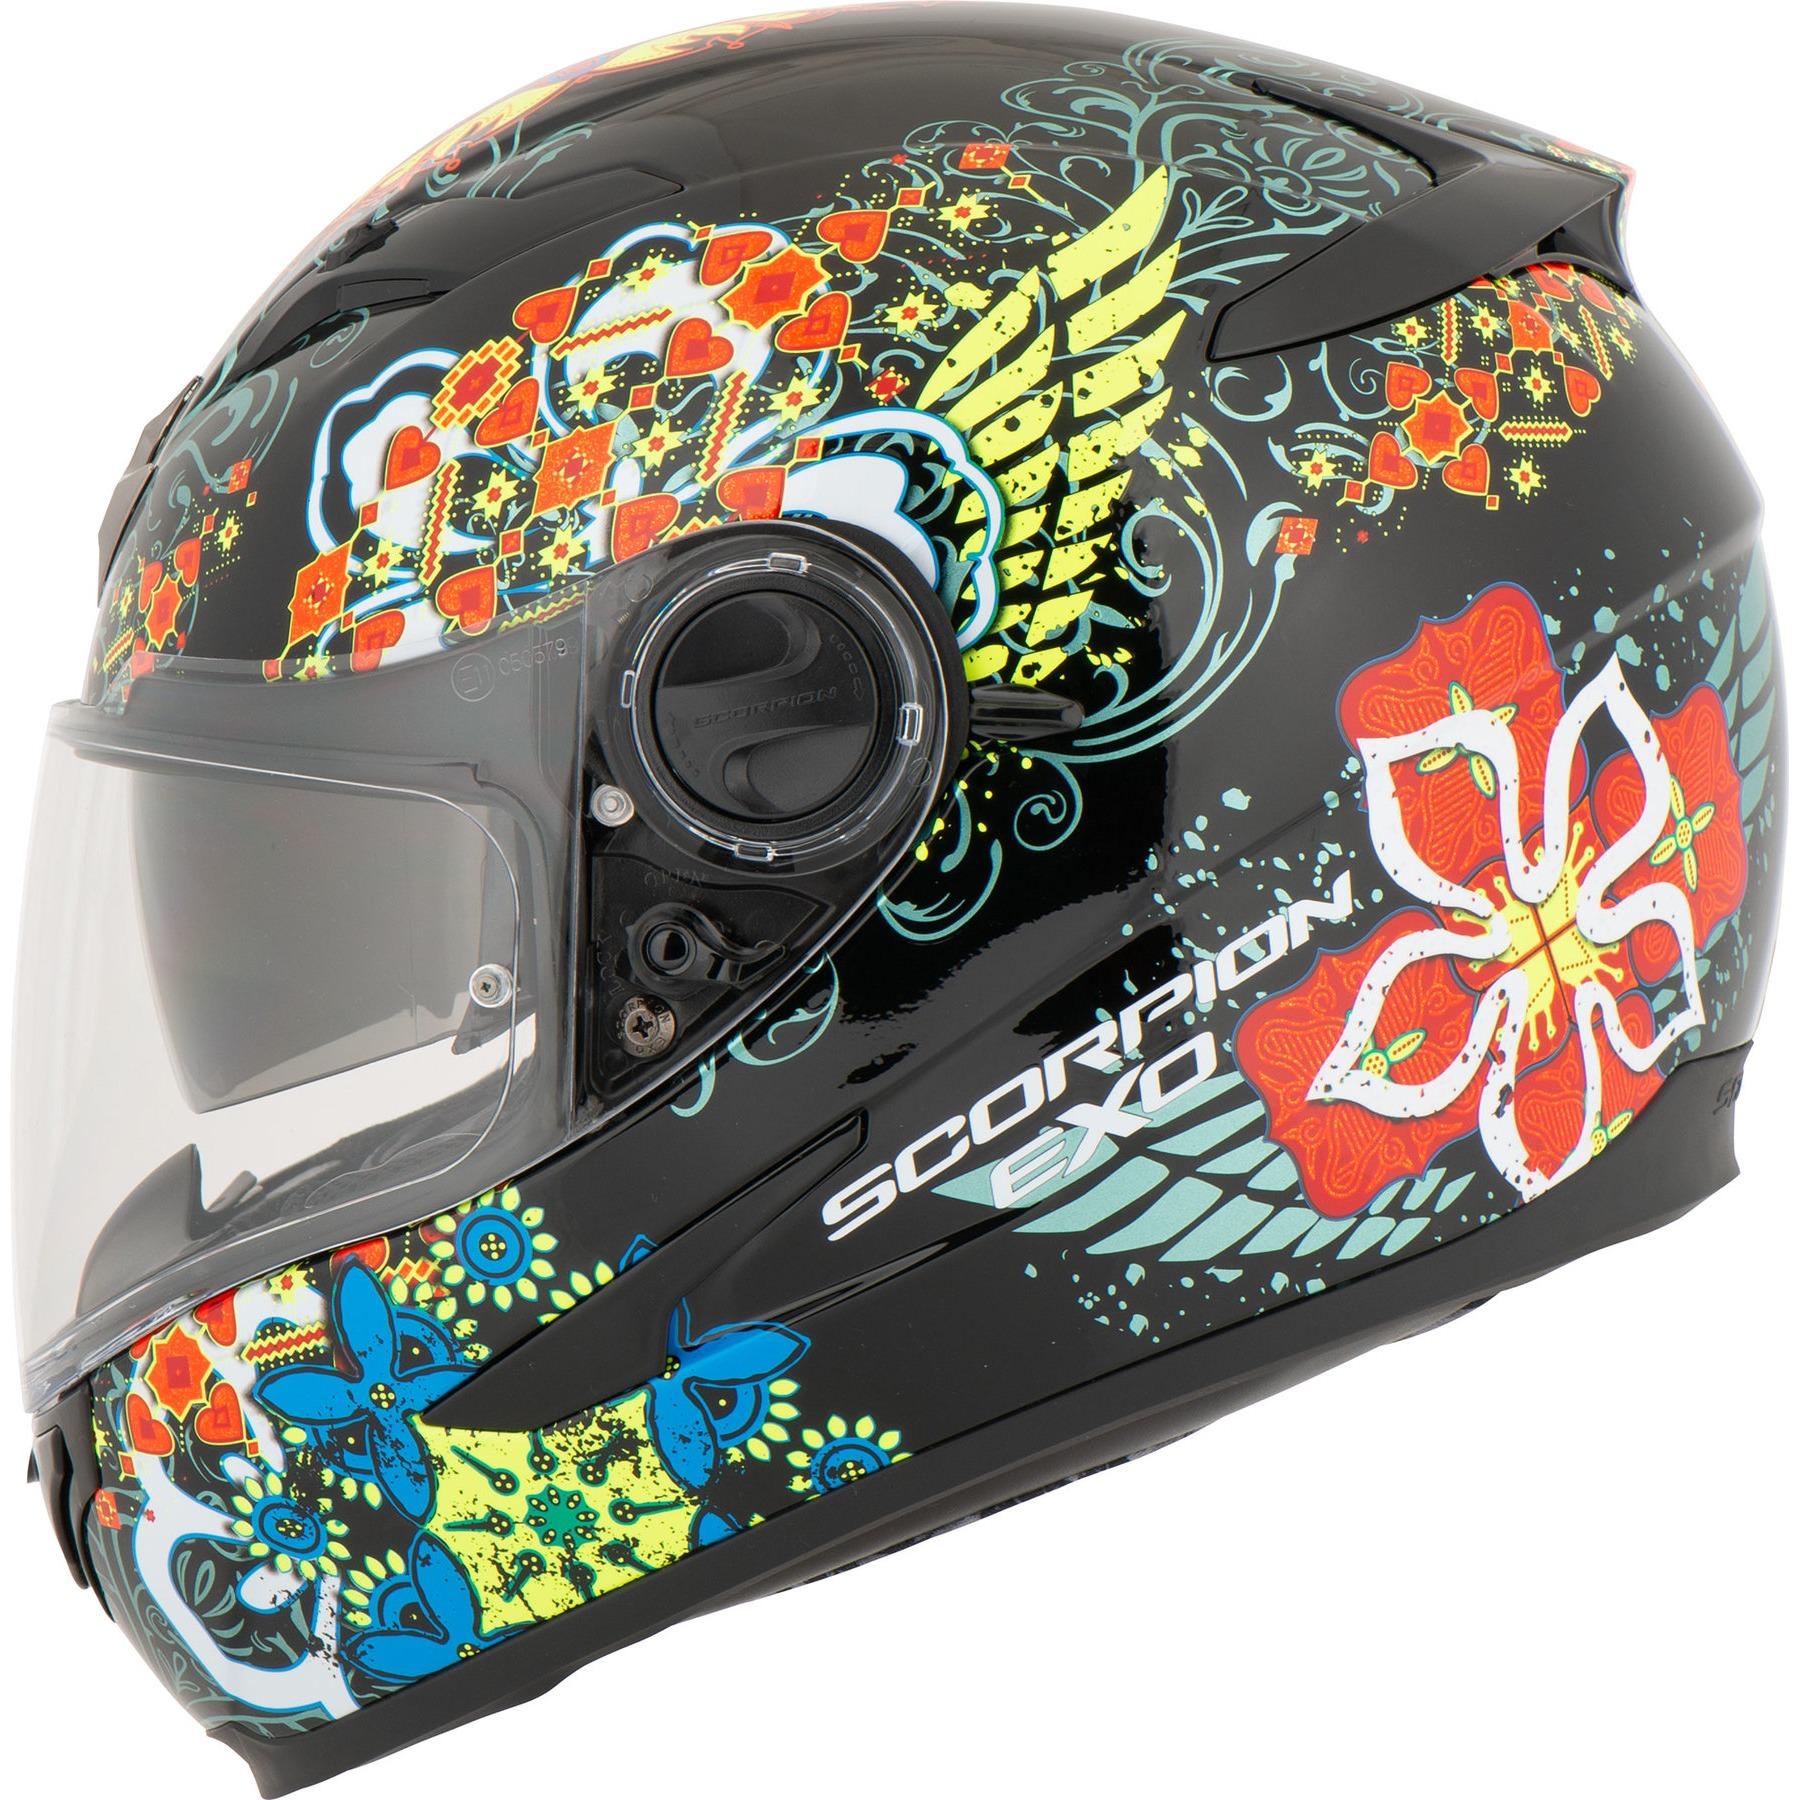 Scorpion EXO 1000 500 490 Motorcycle Helmet Replacement Spare Dark Smoke Visor